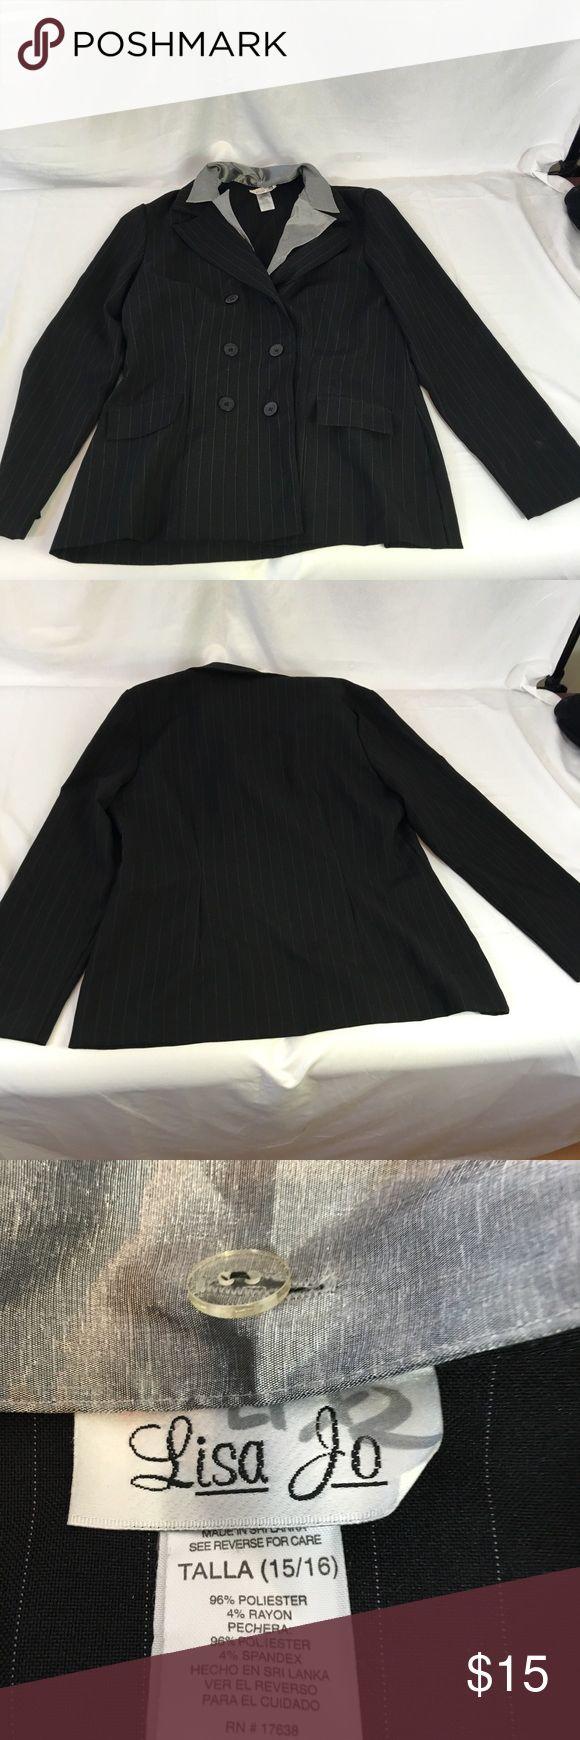 Black Pinstriped Suit 119